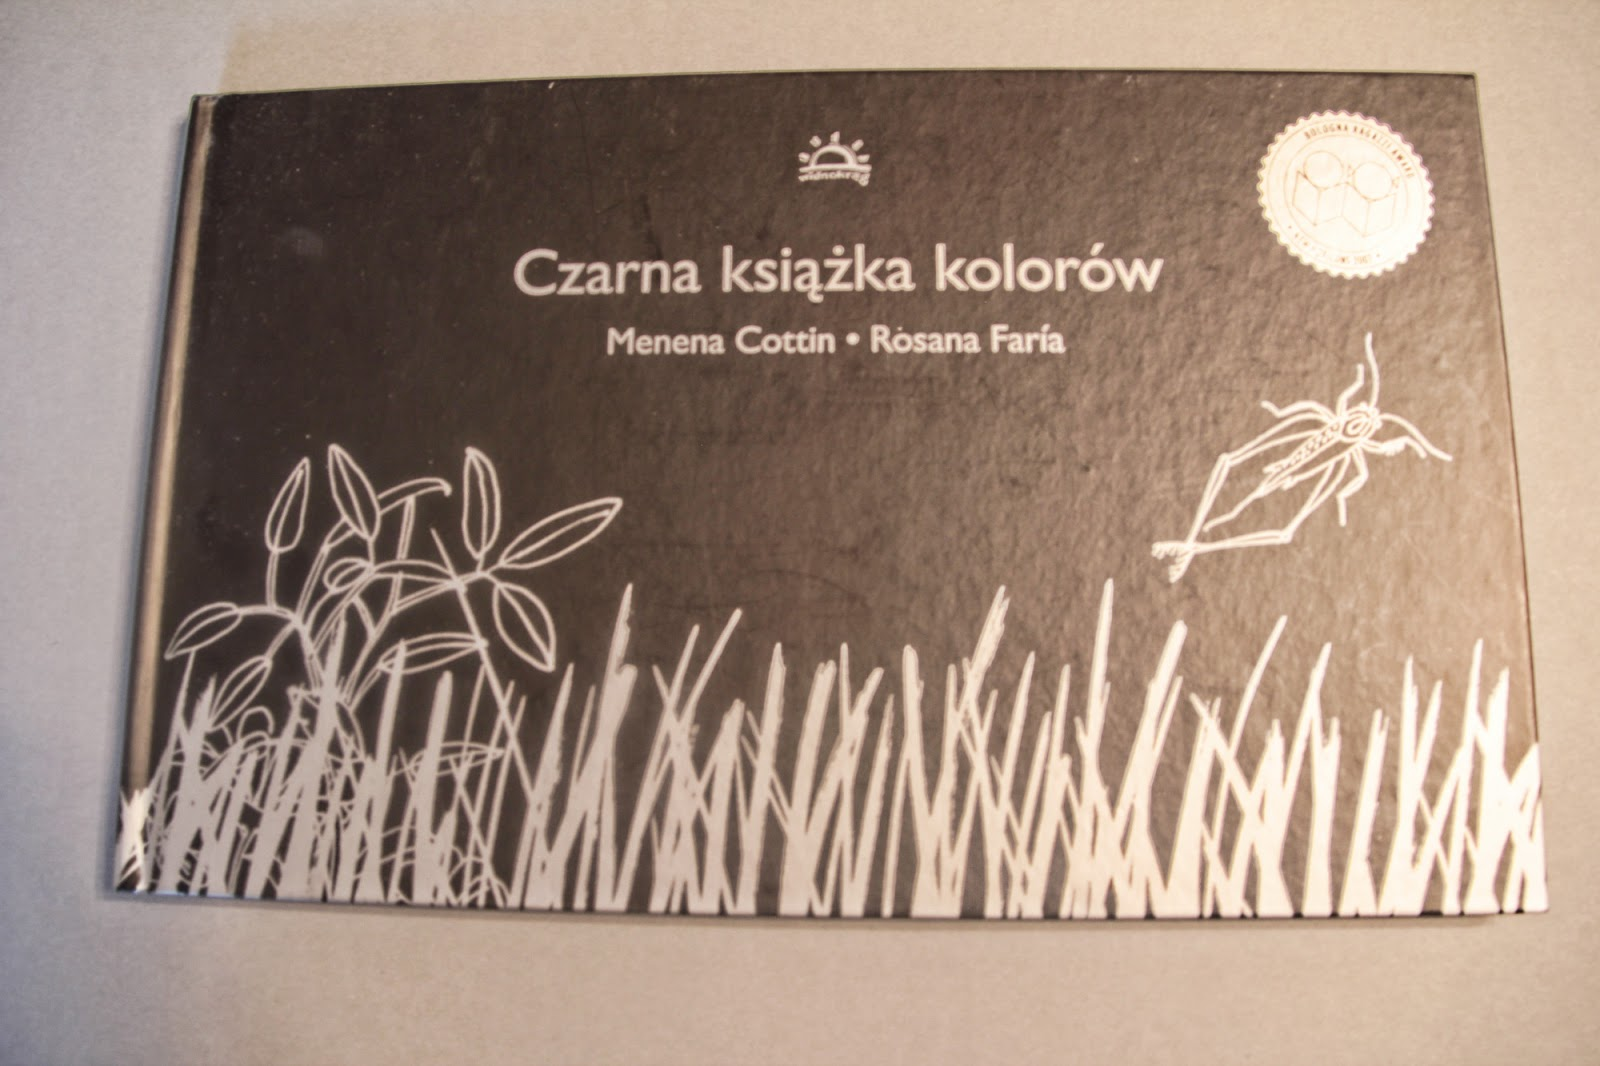 picture book Czarna książka kolorów Menena Cottin, Rosaria Faria, Widnokrąg